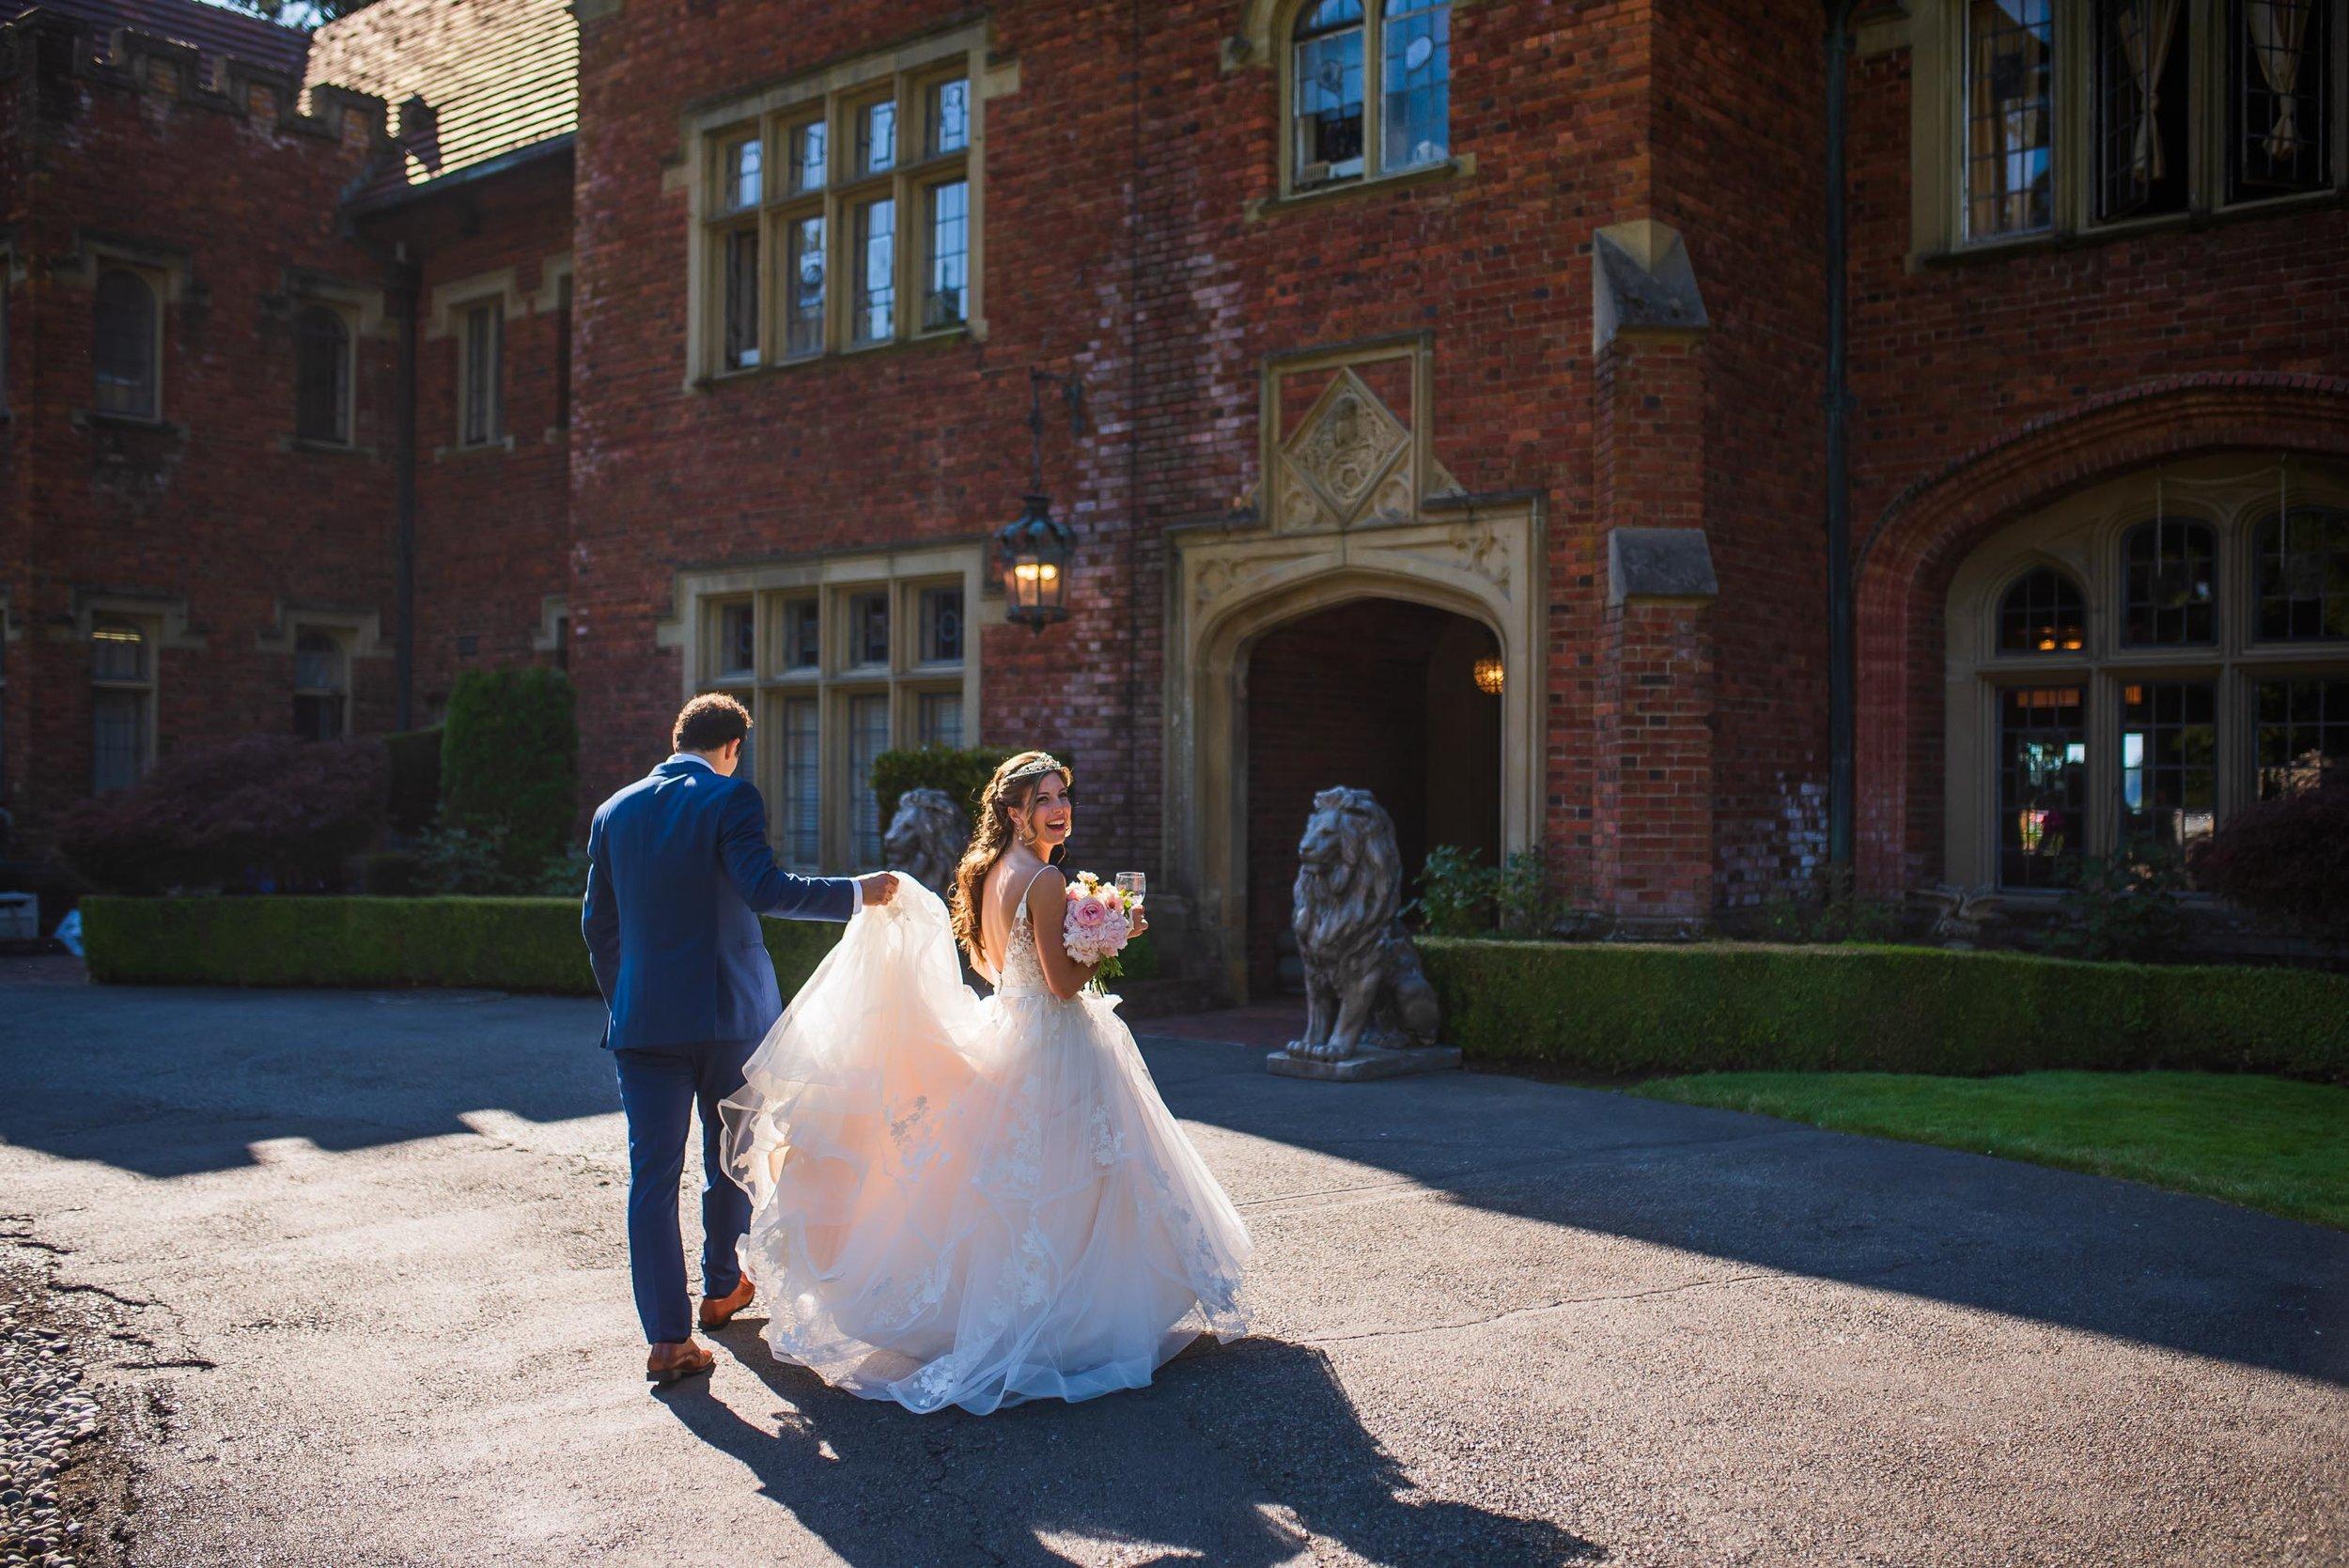 thornewood castle wedding 57.jpg